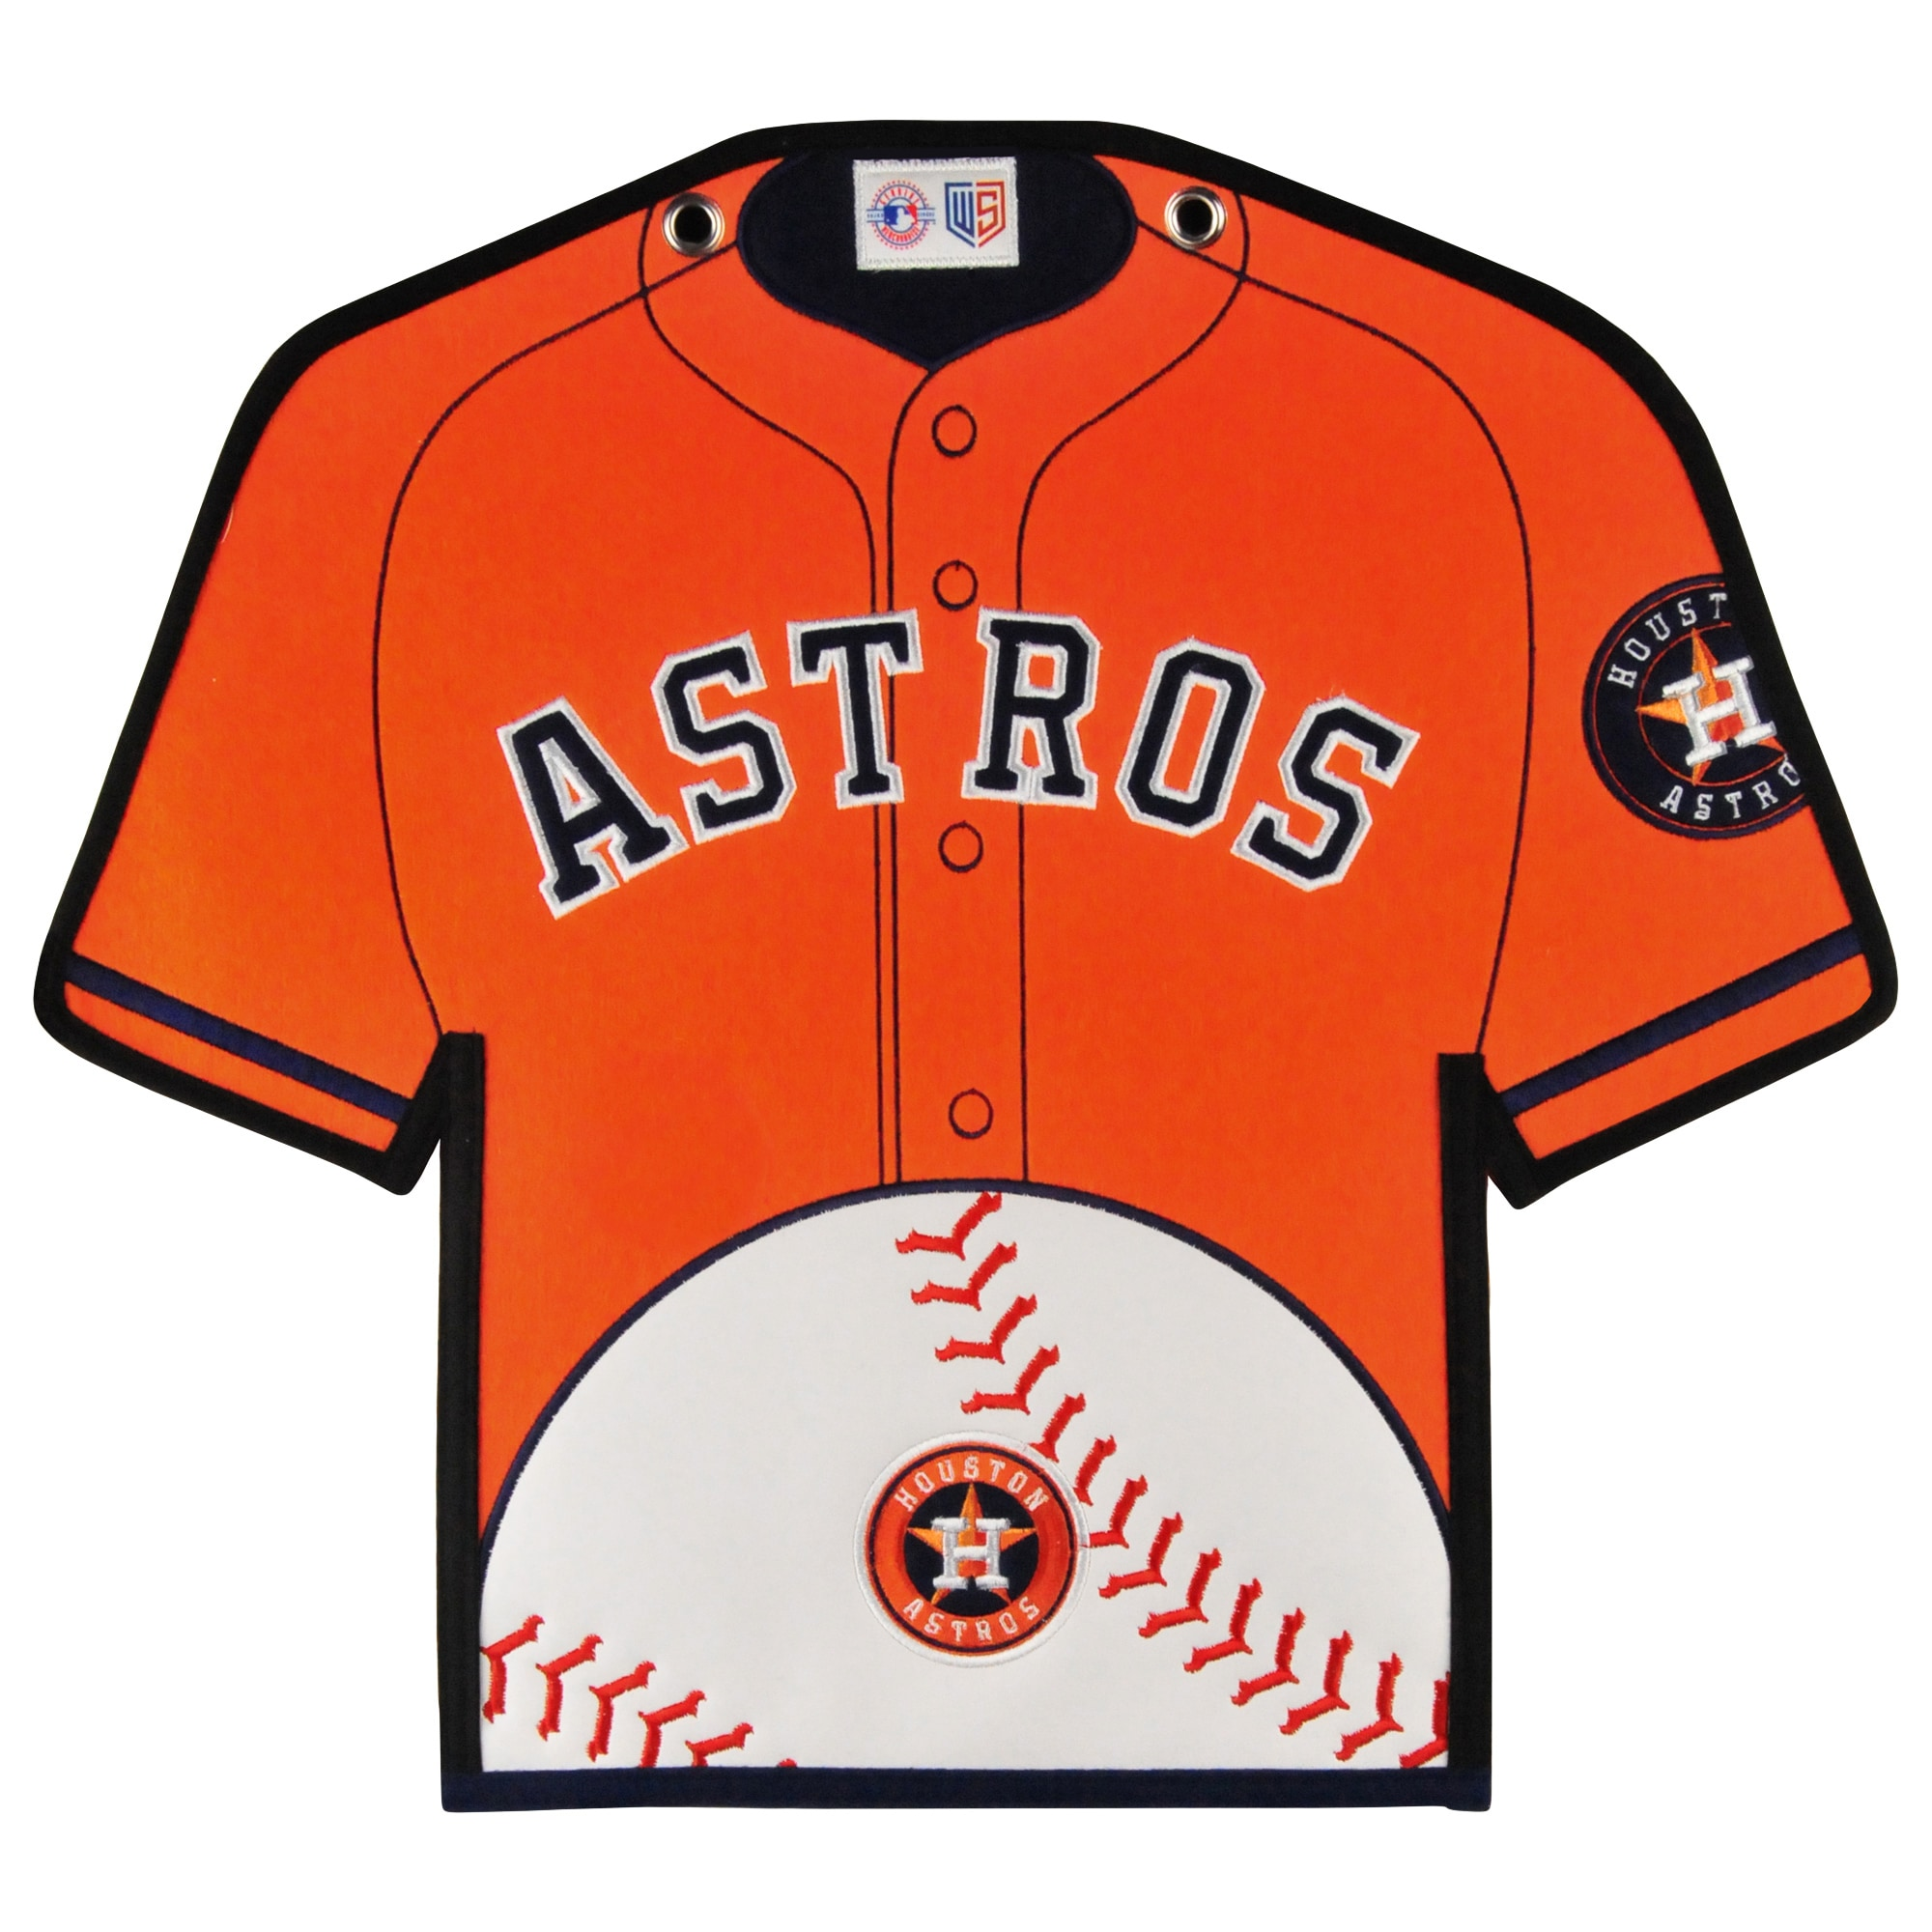 Houston Astros 14'' x 22'' Jersey Traditions Banner - Orange/Navy